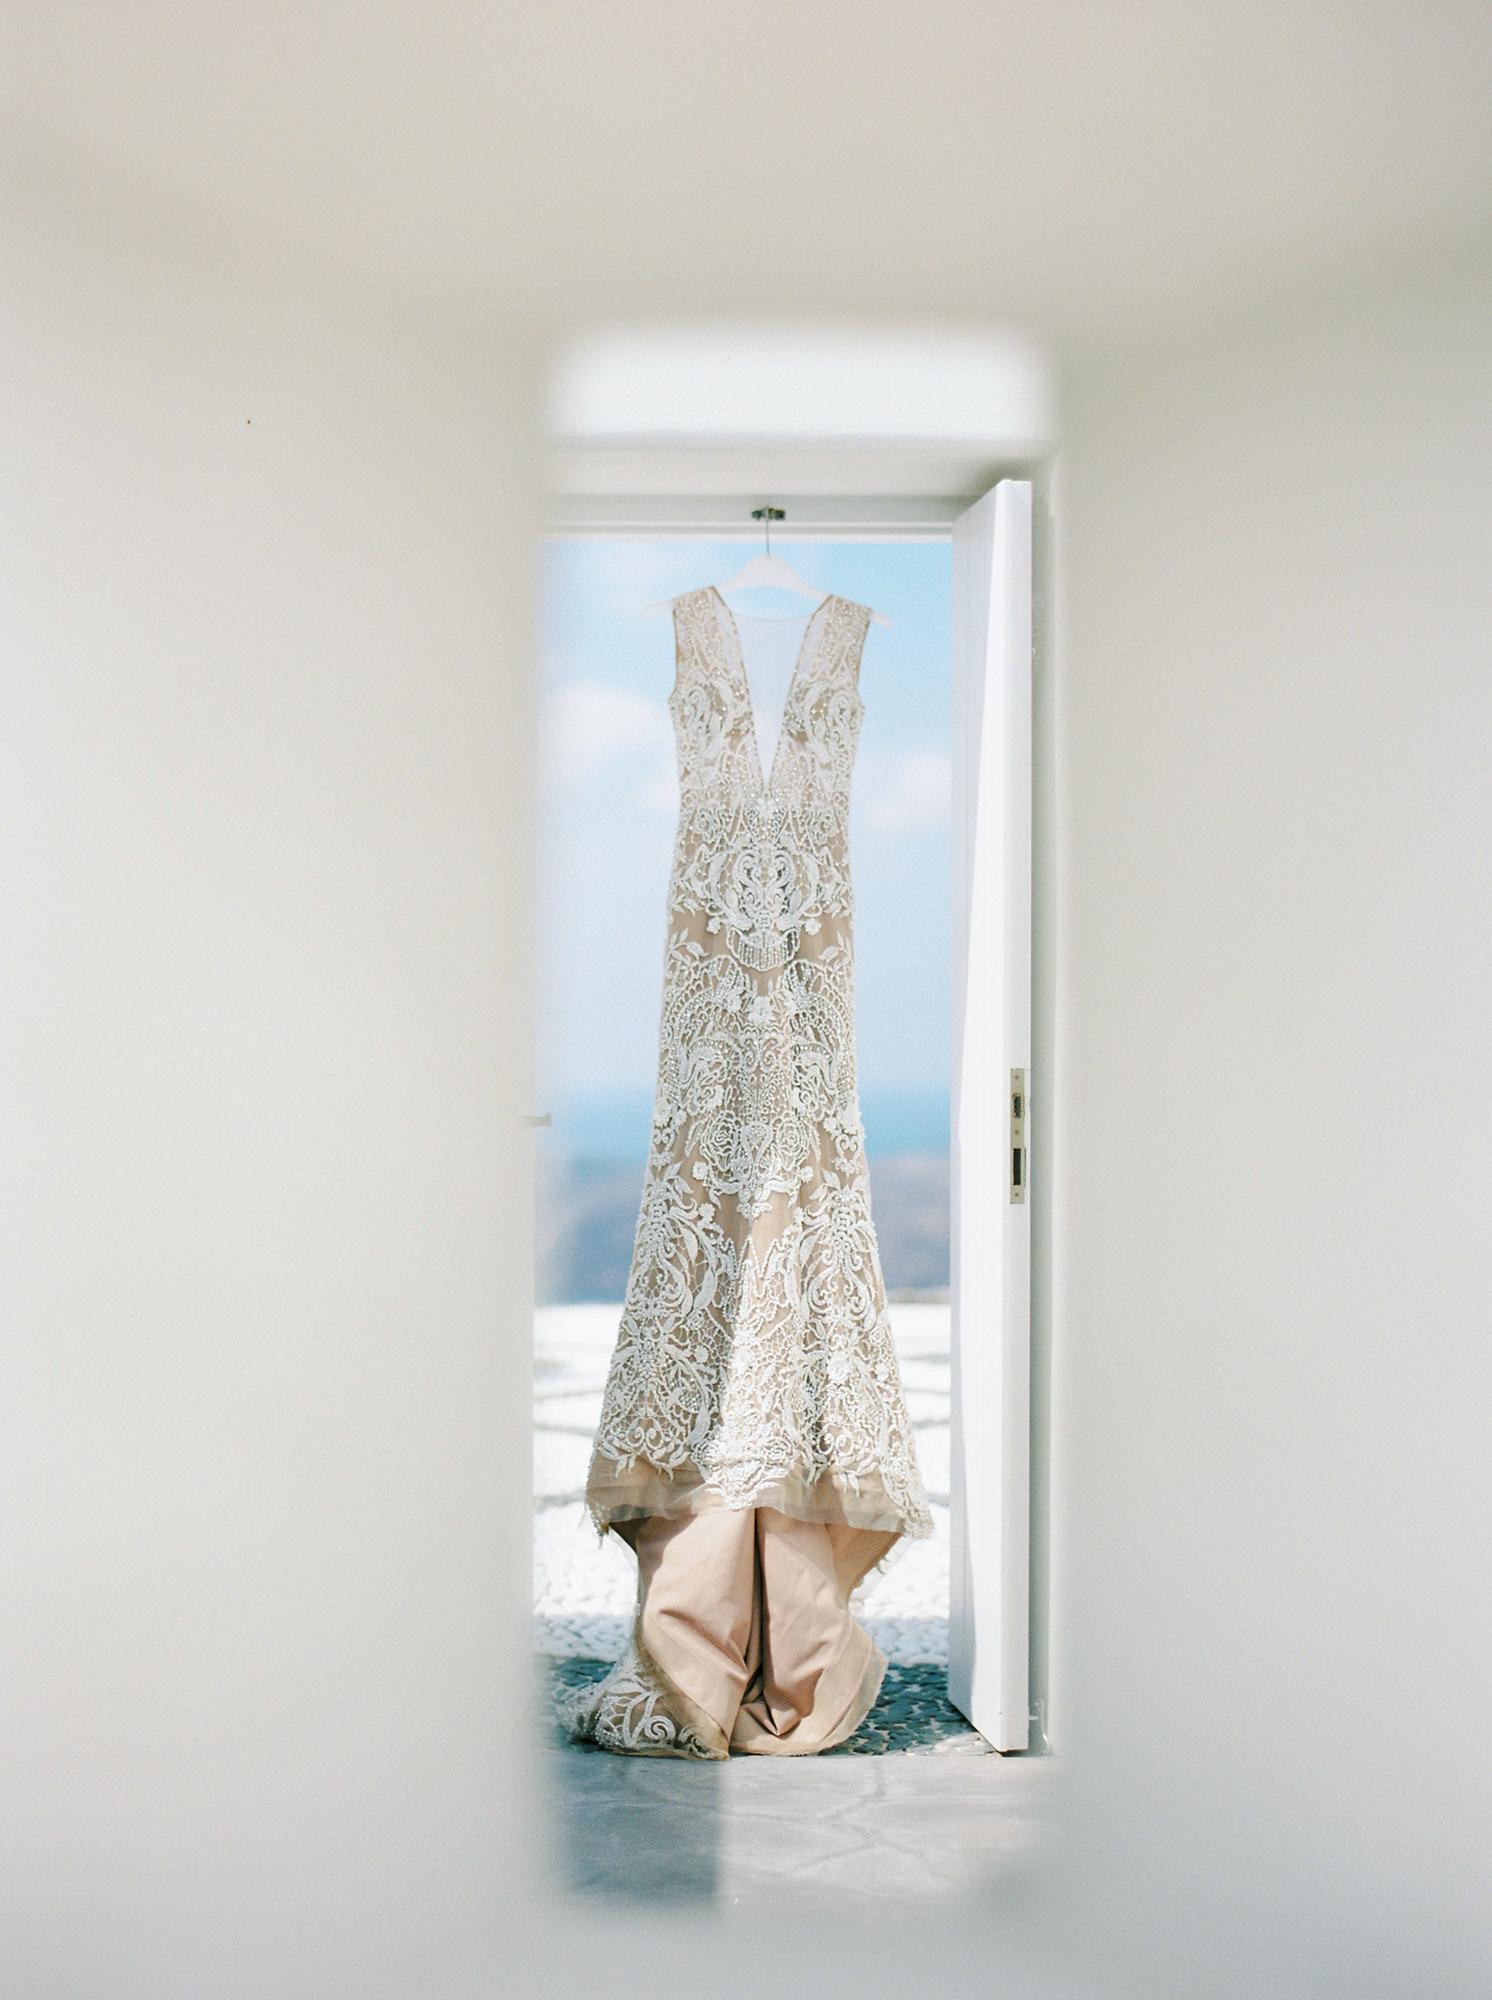 angie prayogo wedding bride wedding dress hanging in doorway